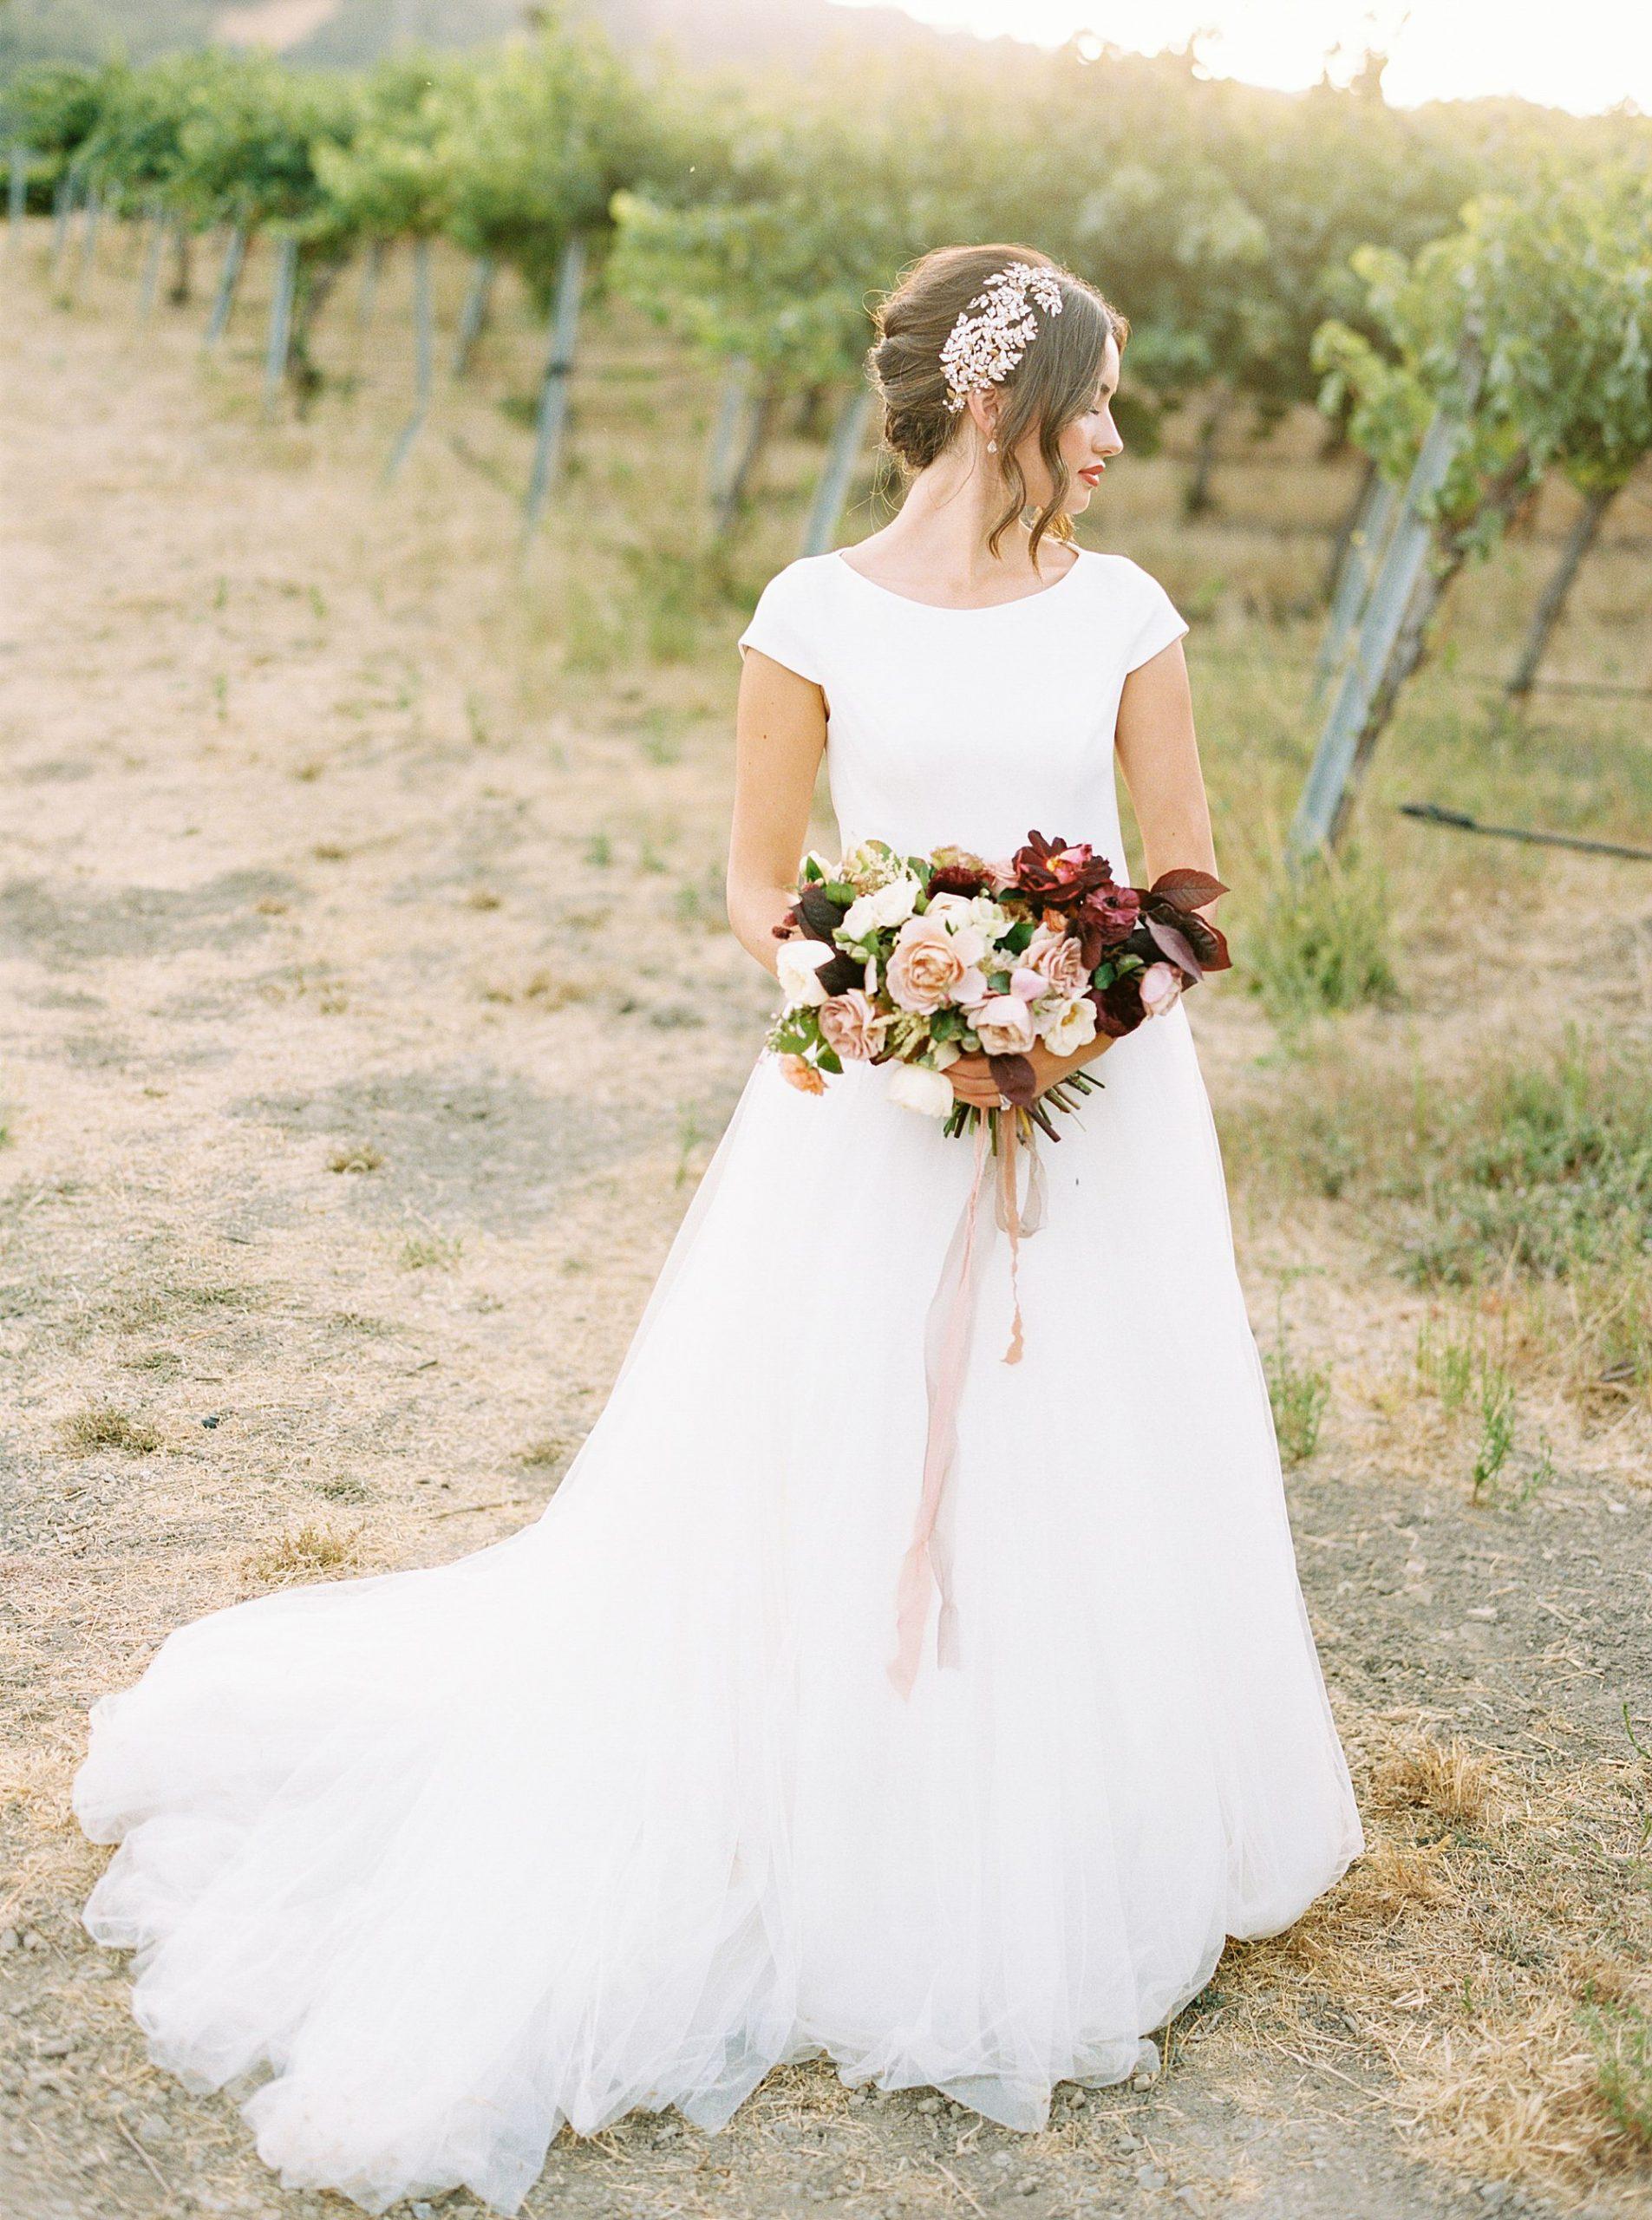 HammerSky Wedding Inspiration Featured on Hey Wedding Lady with Vanessa Noel Events - Ashley Baumgartner - SLO Wedding Photographer_0018.jpg